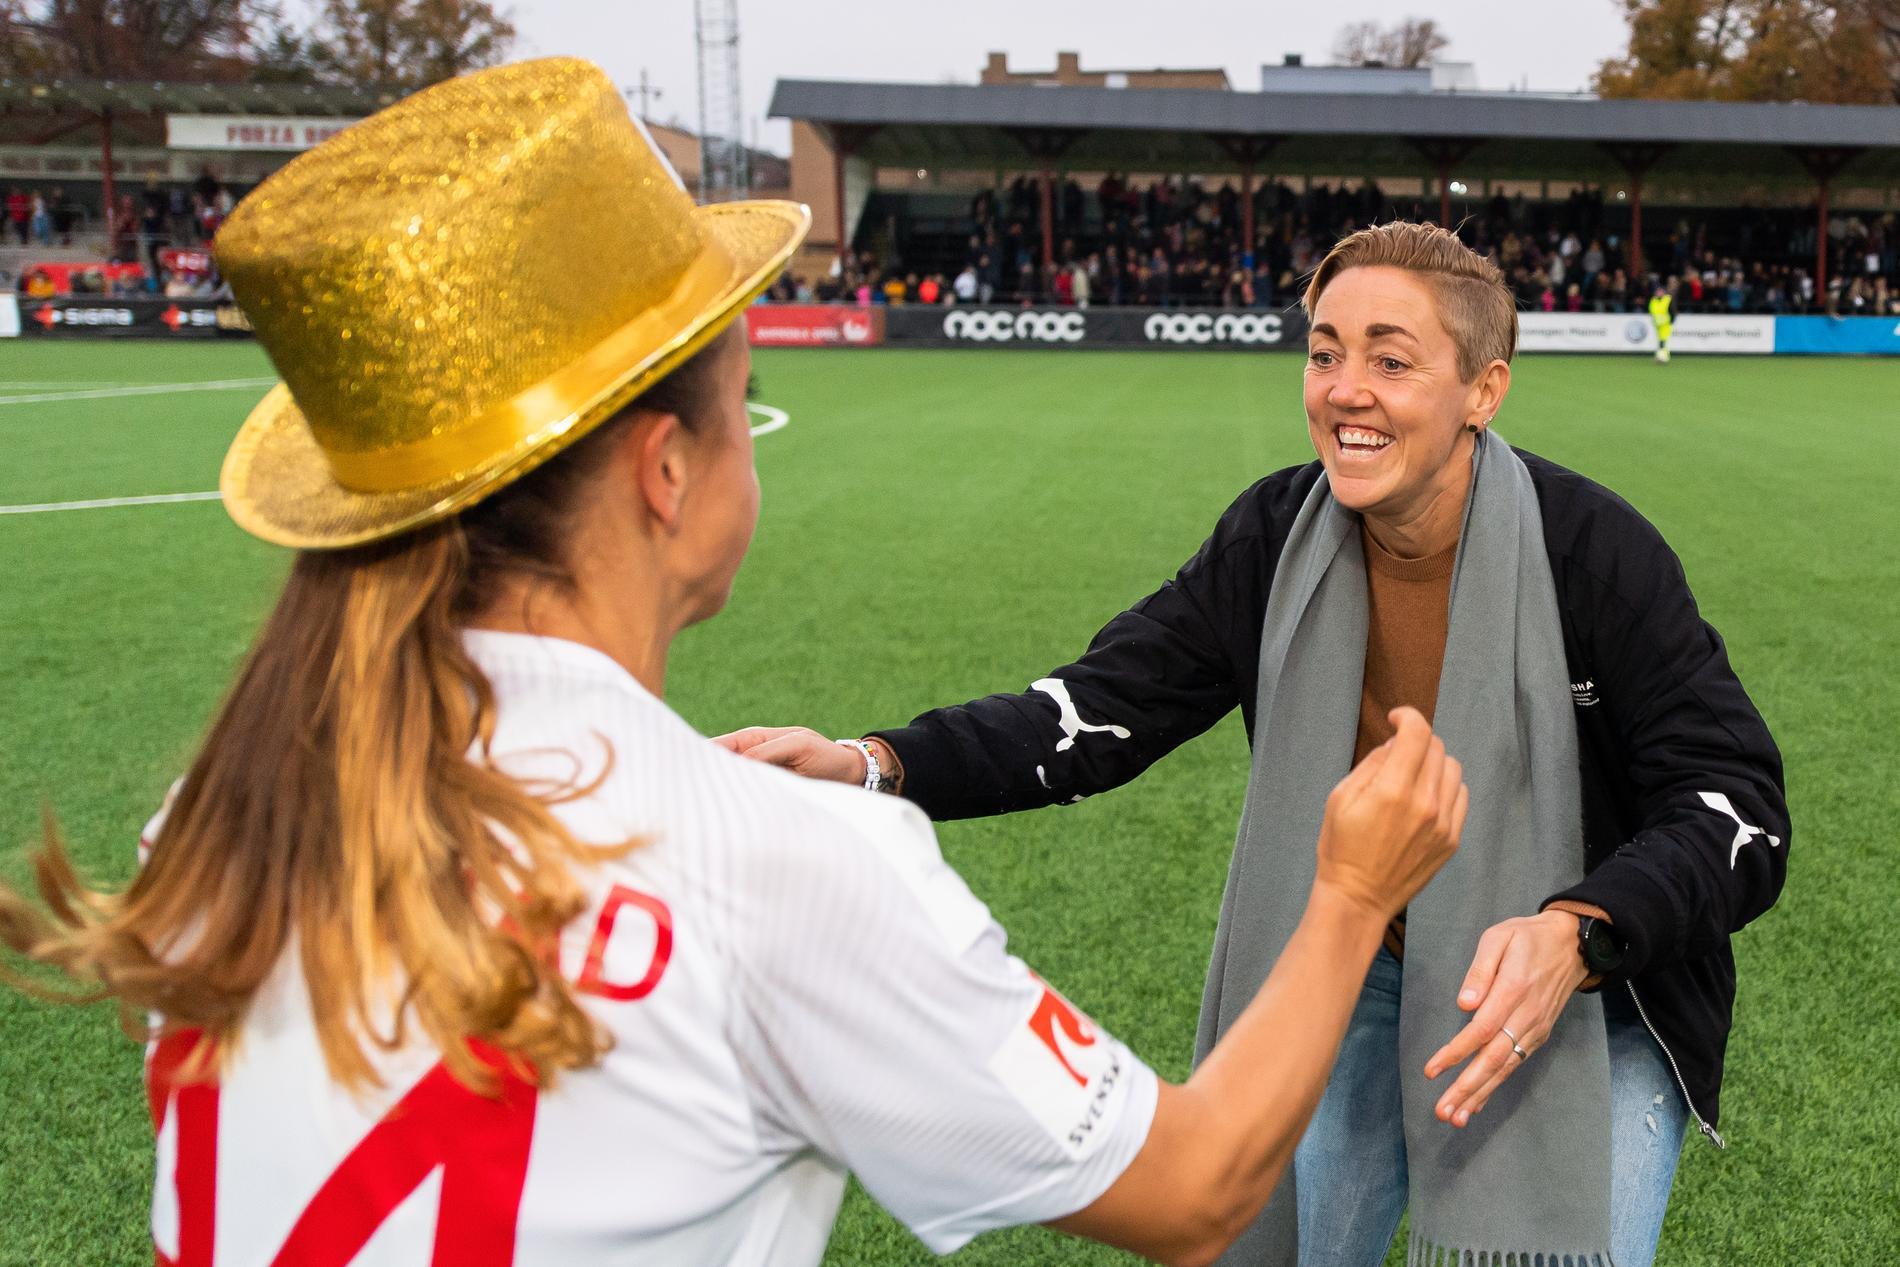 Rosengårds sportchef Therese Sjögran firar guldet ihop med Malin Levenstad.